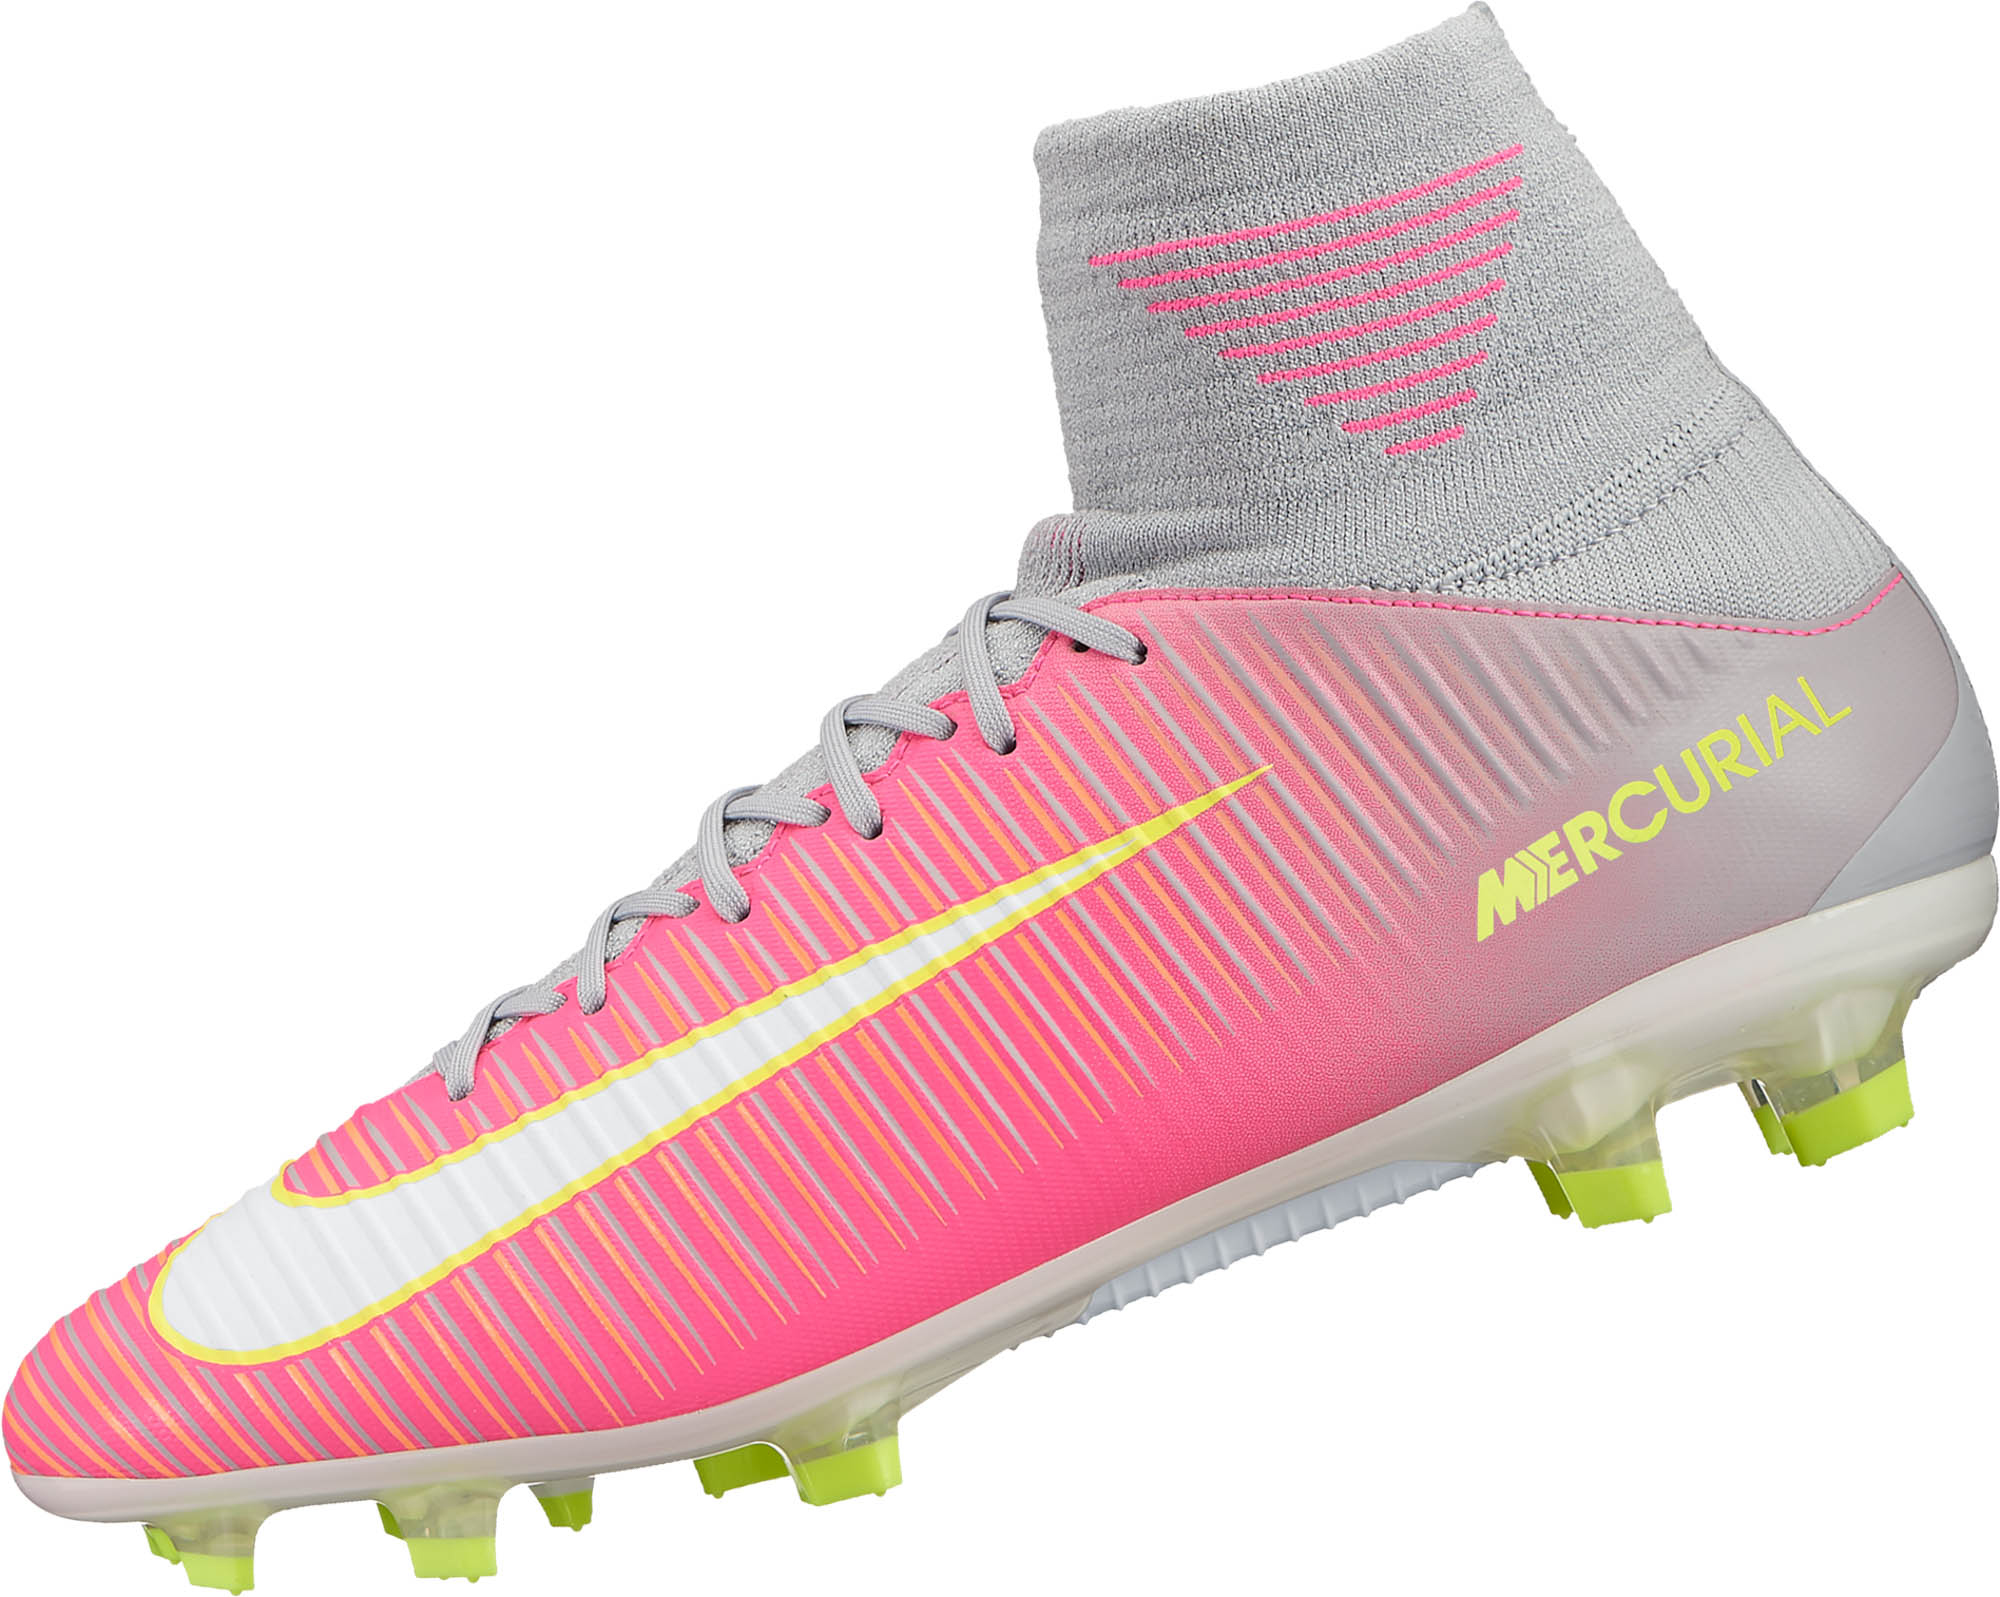 741957979c90 Nike Womens Mercurial Veloce III DF FG - Hyper Pink   White ...